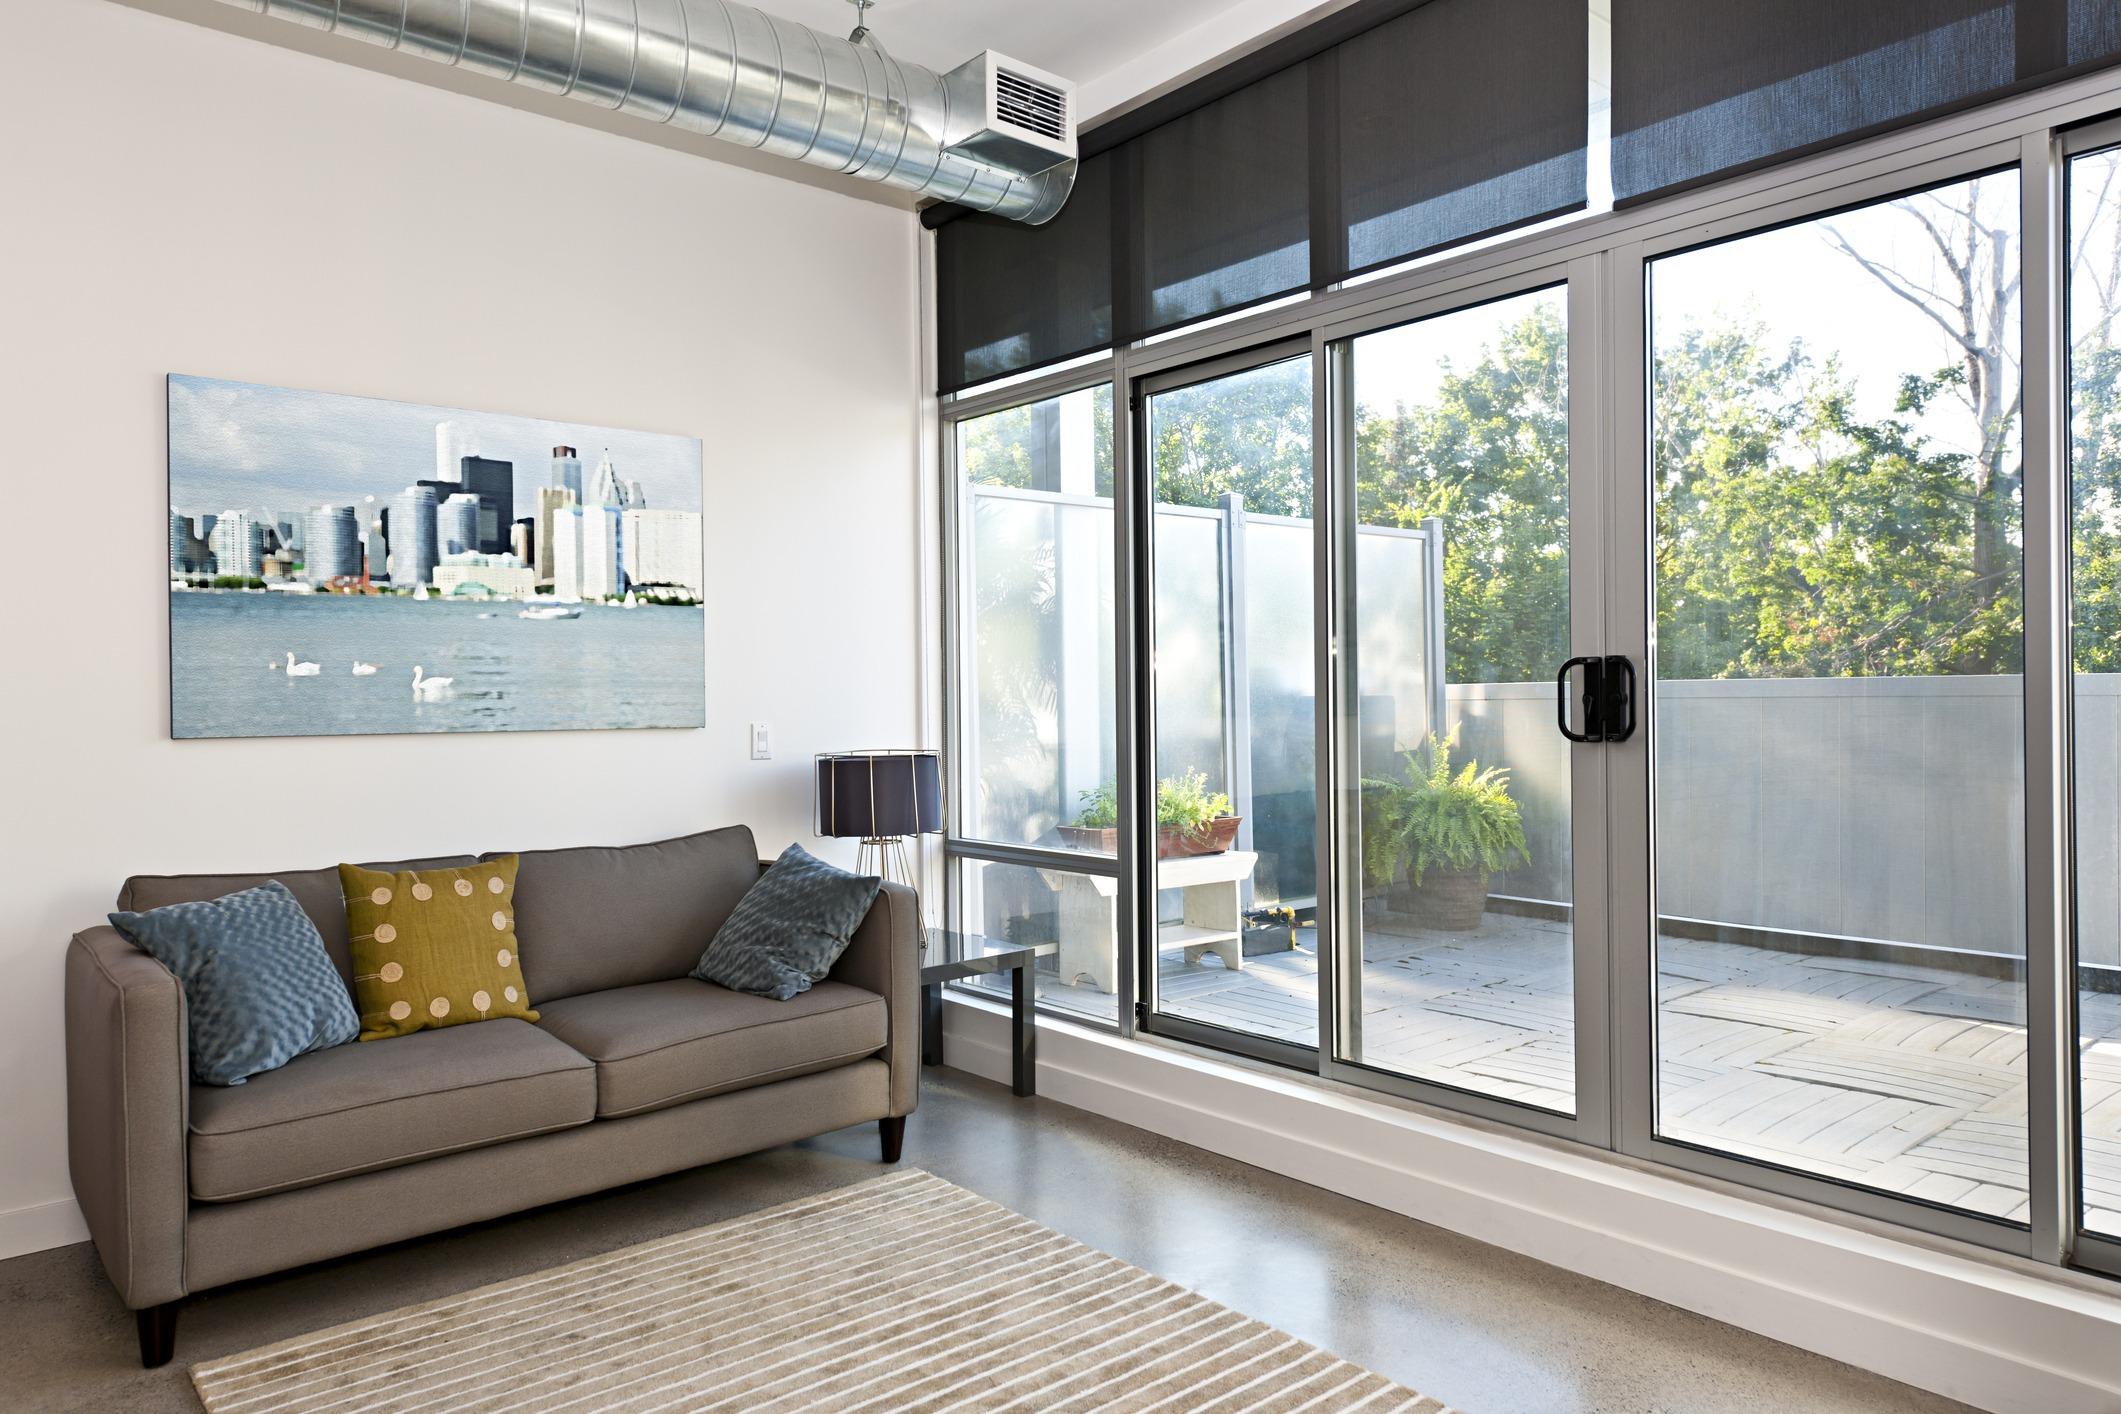 Living room with sliding glass patio door to balcony